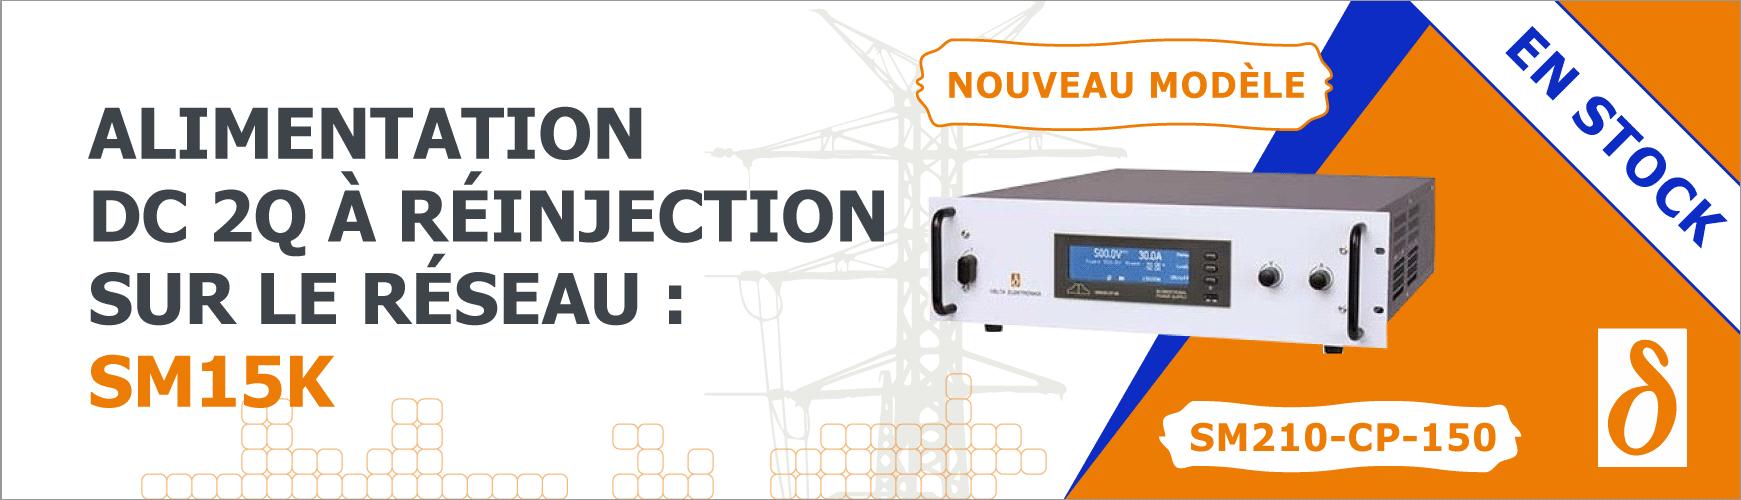 Alimentation DC bidirectionnelle 15 kW : SM210-CP-150